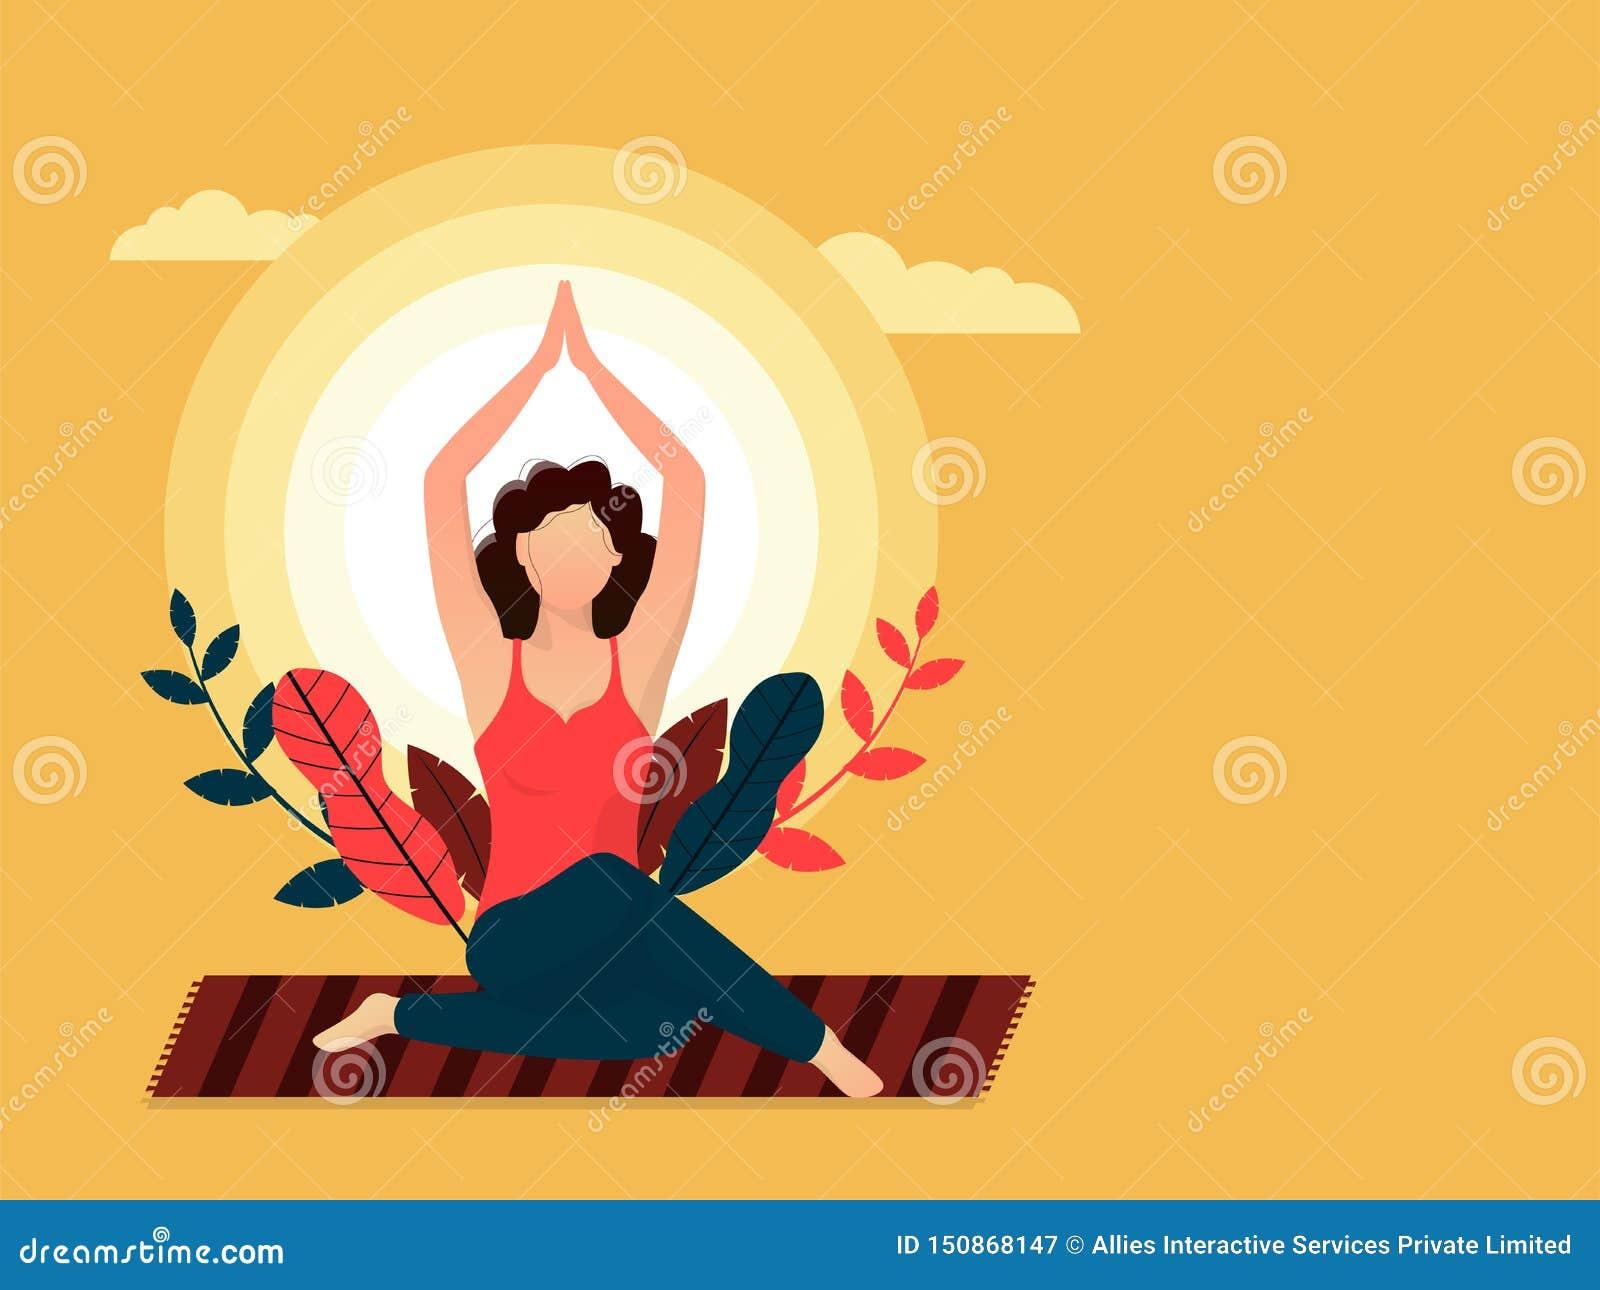 Yoga Banner Stock Illustrations 23 248 Yoga Banner Stock Illustrations Vectors Clipart Dreamstime